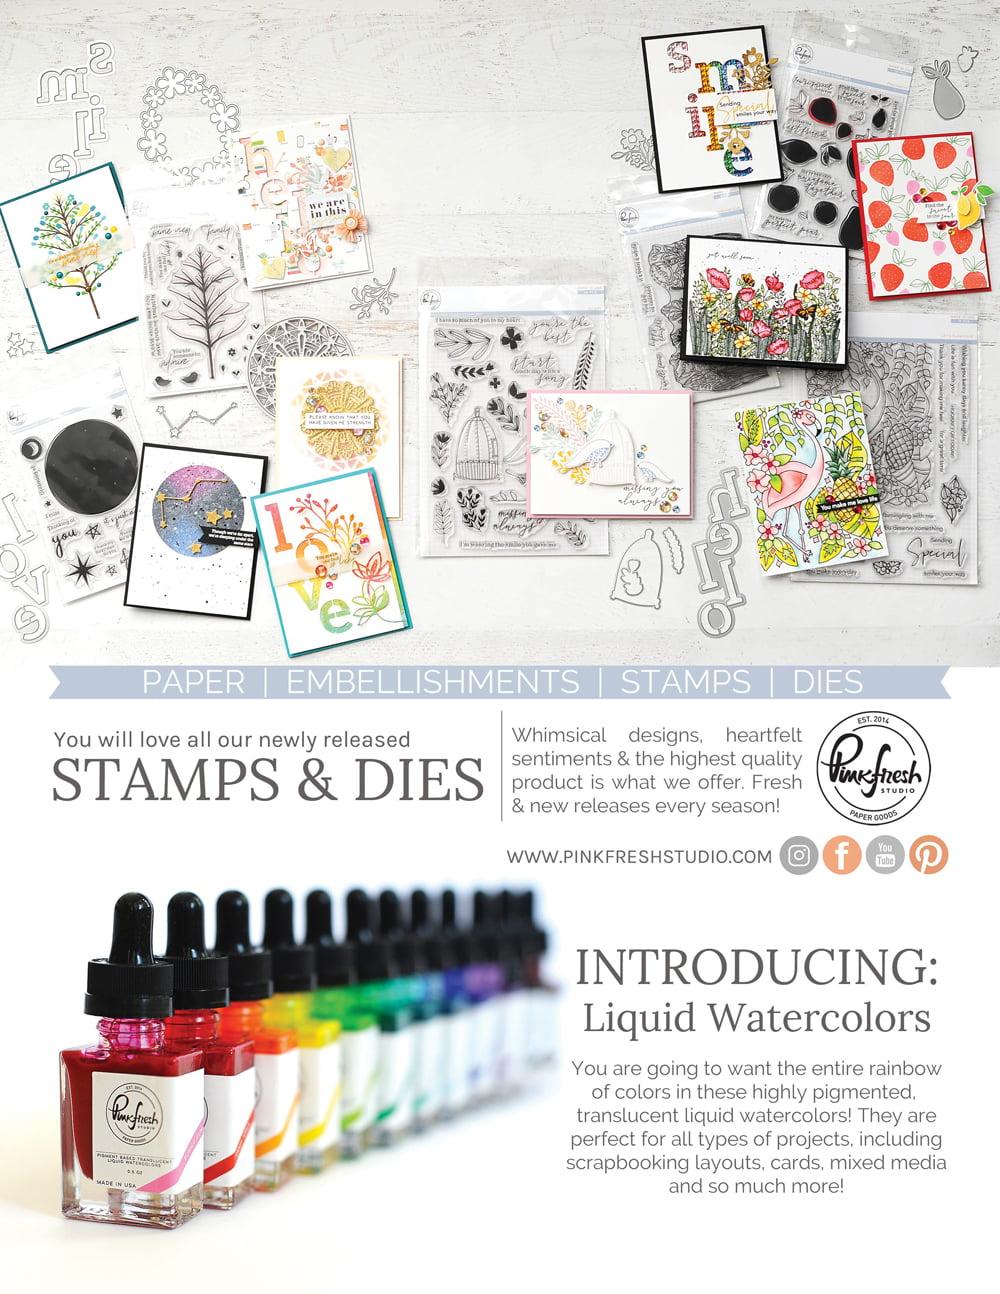 Pinkfresh Studio Ad - Scrapbook & Cards Today Summer 2018 Issue